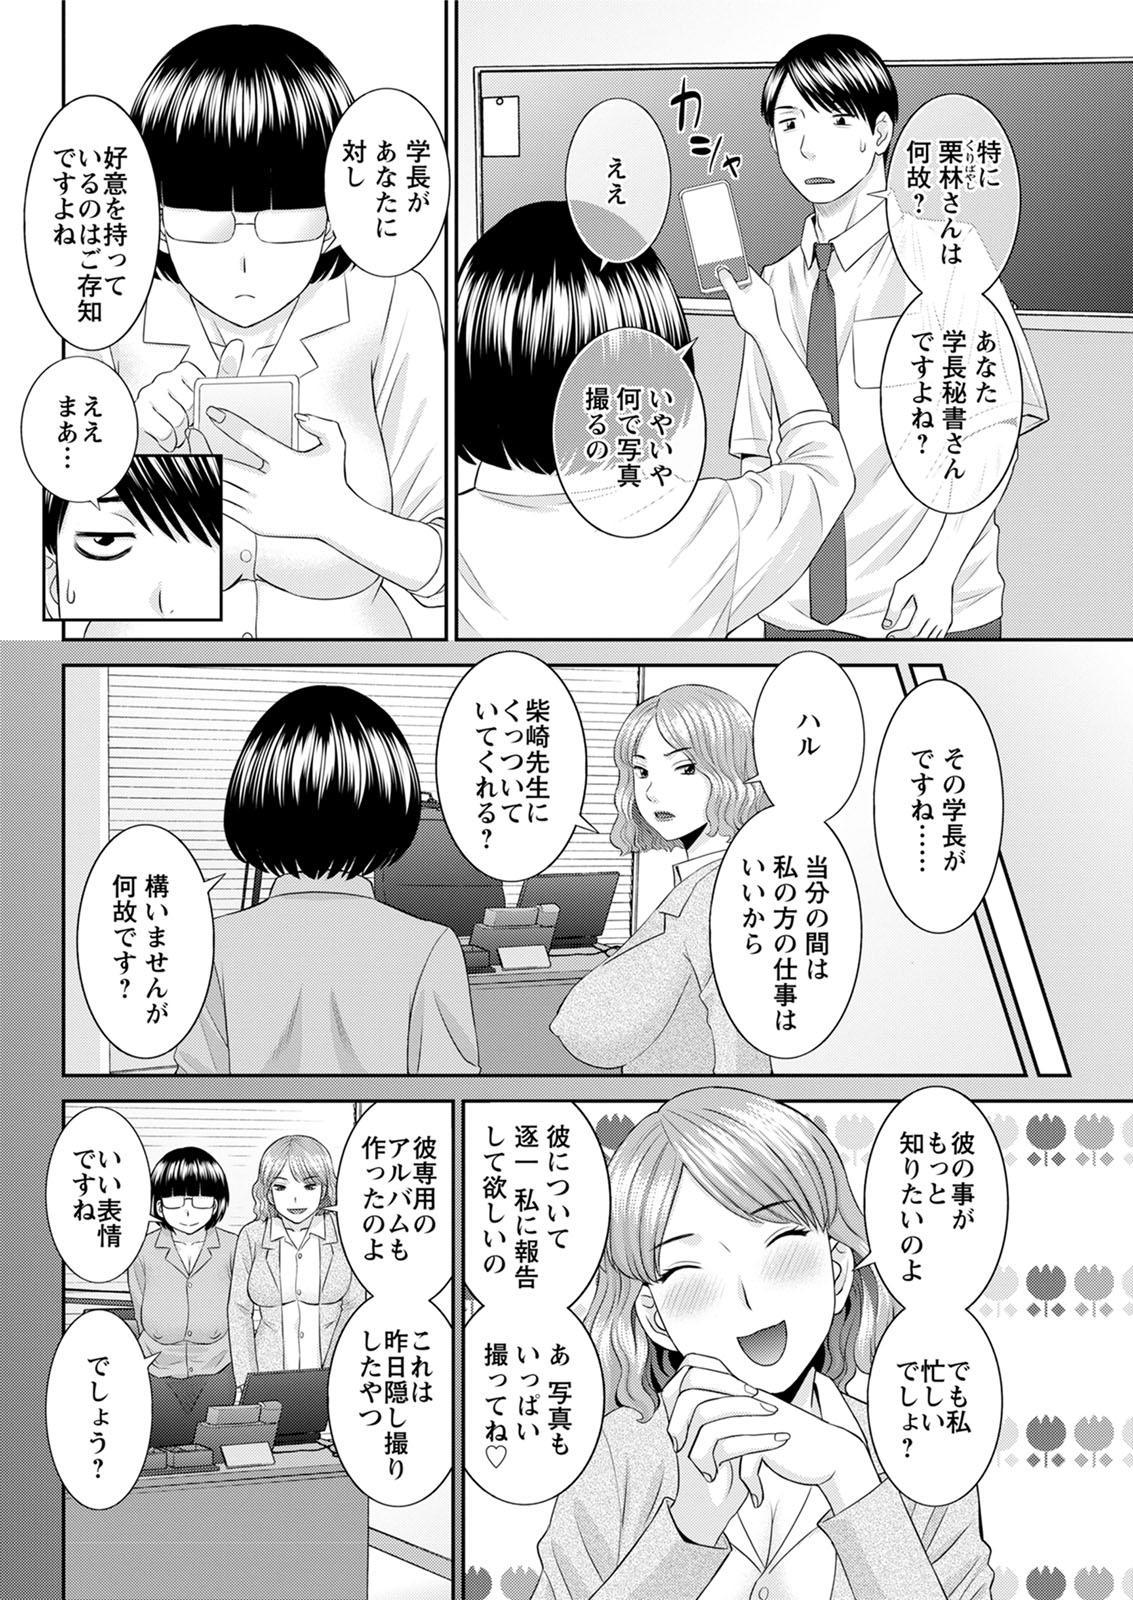 [Kawamori Misaki] Kaikan Hitotsuma Gakuen Ch. 1-6, 8-16 [Digital] 258